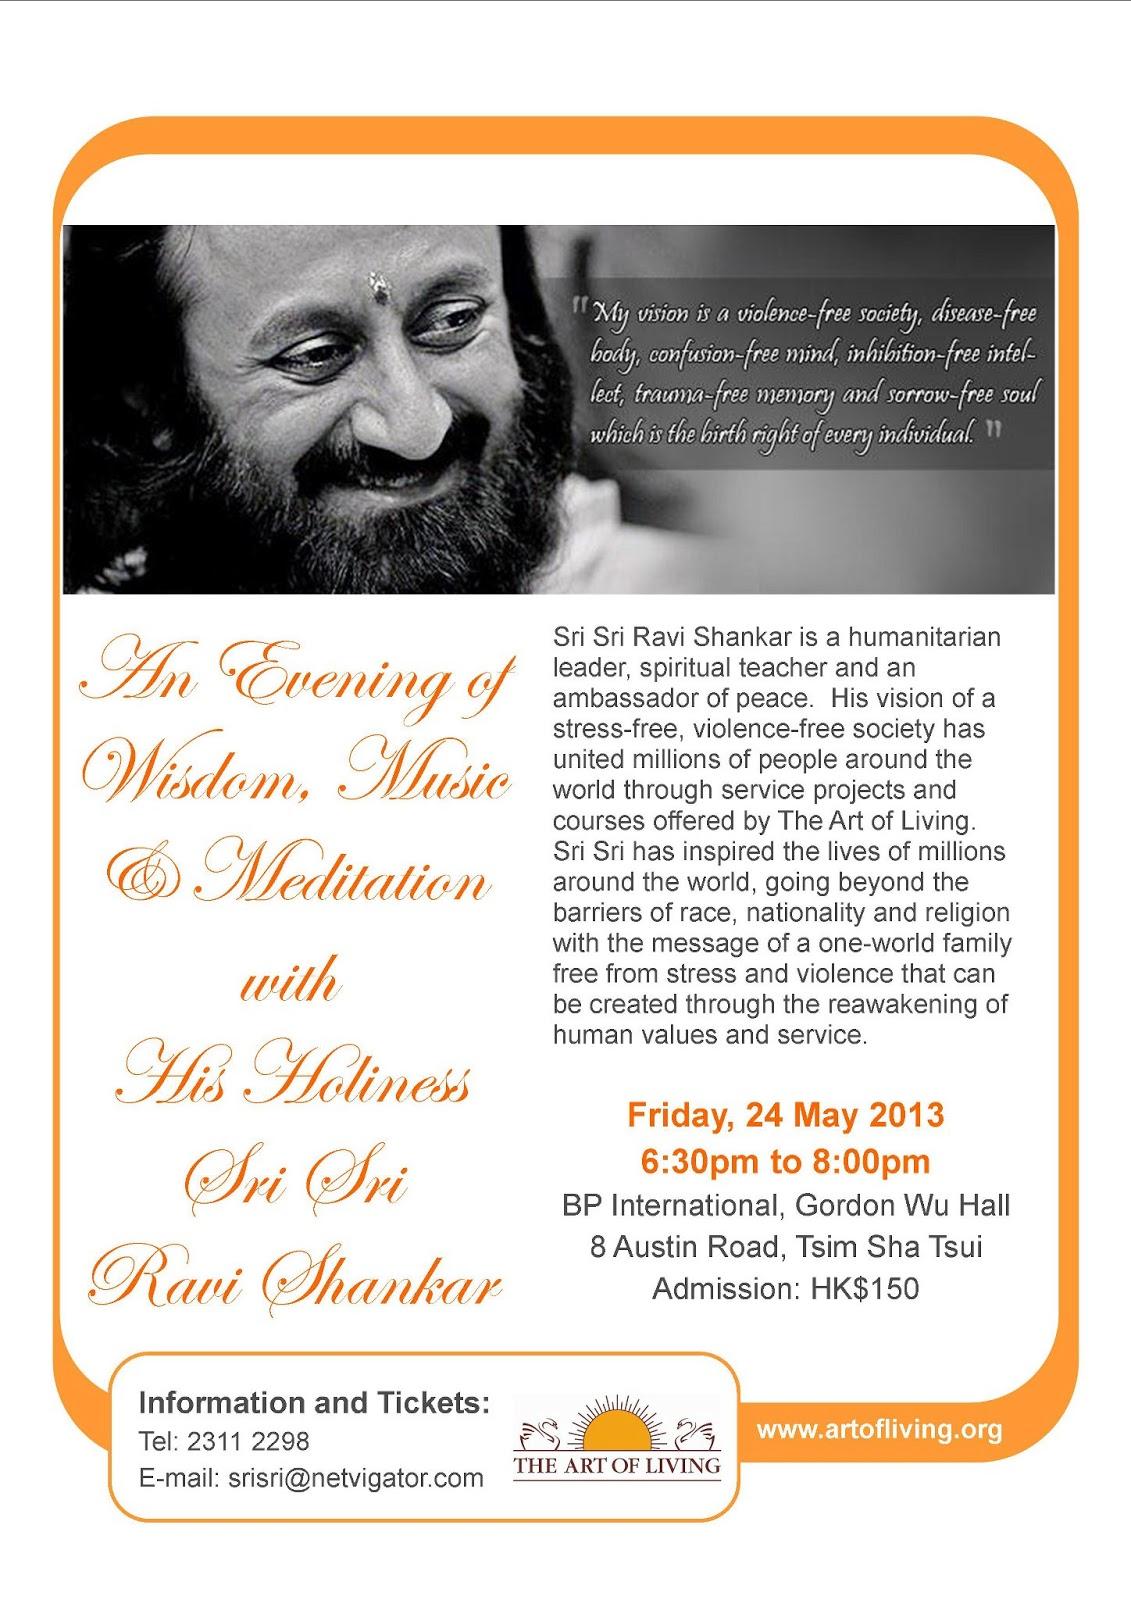 An evening of Wisdom, Music and Meditation with Sri Sri Ravi Shankar | May 2013